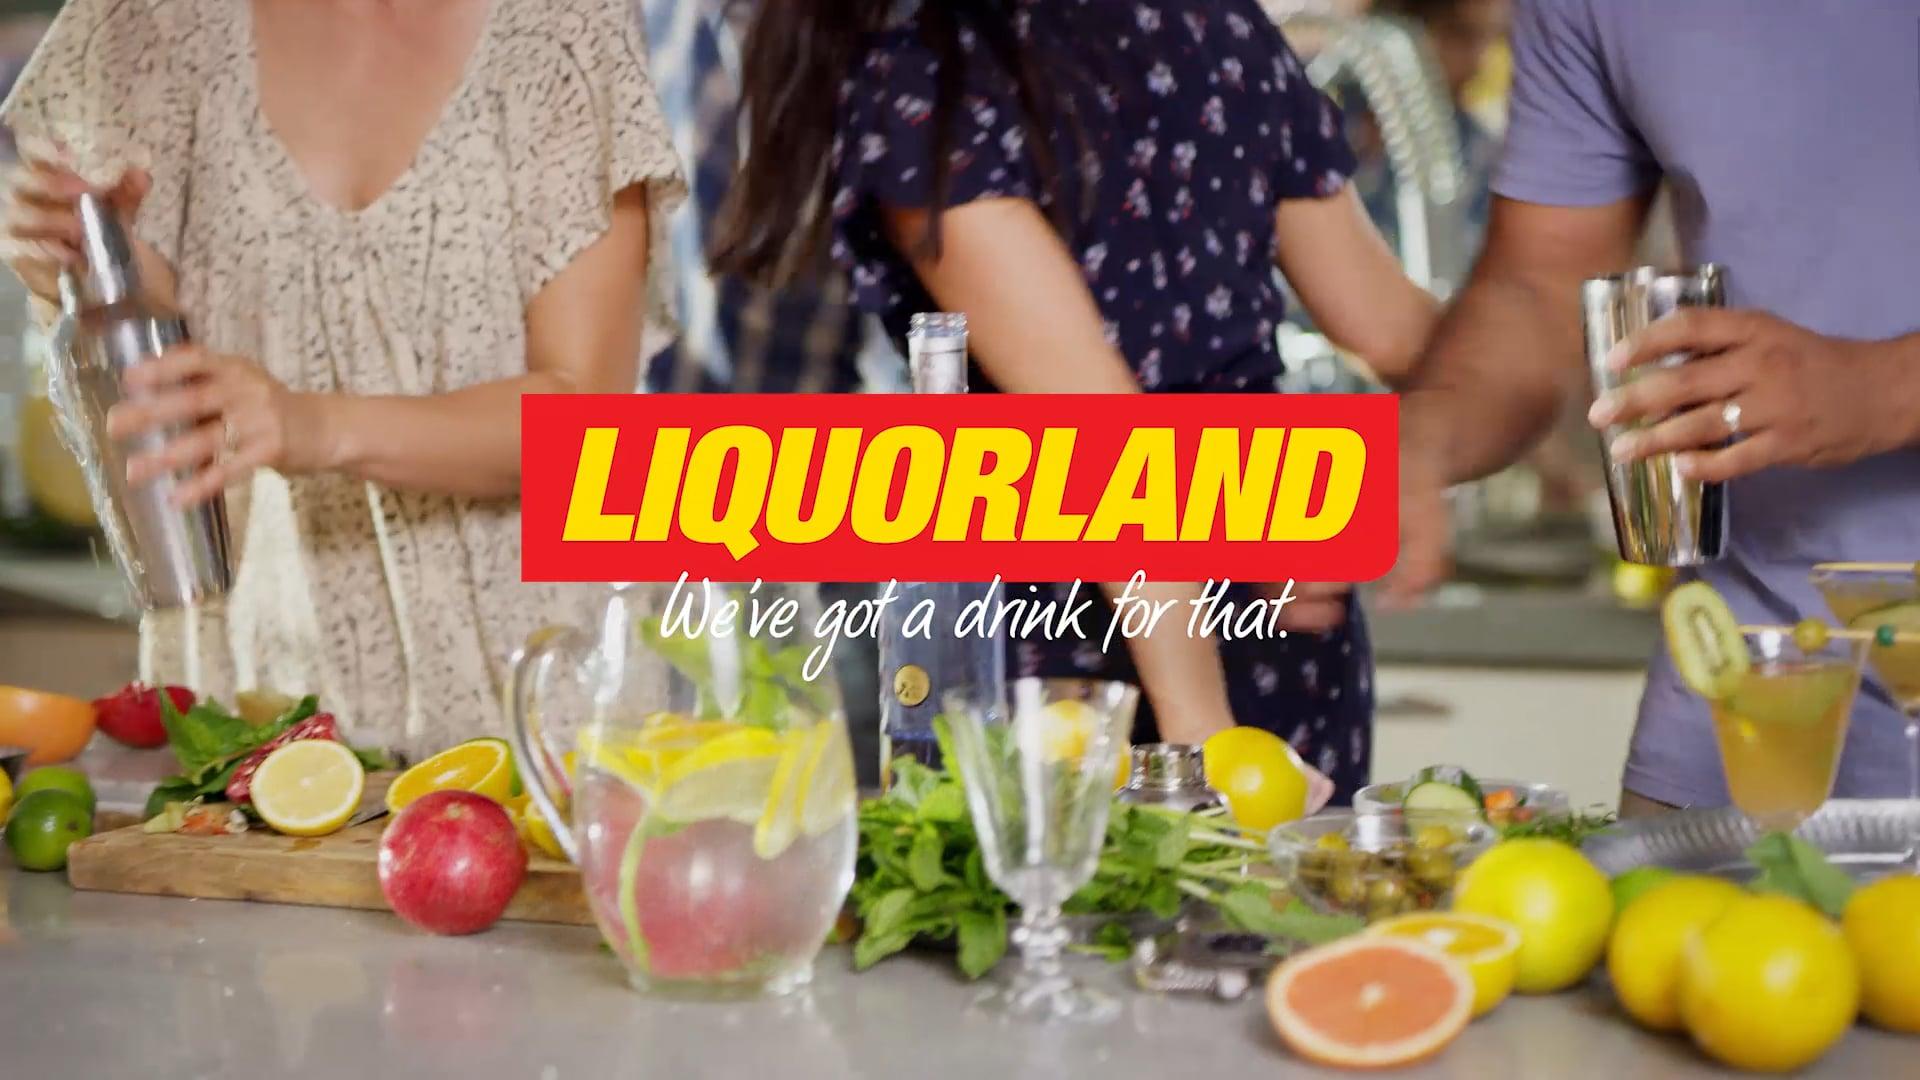 Liquorland Cocktails